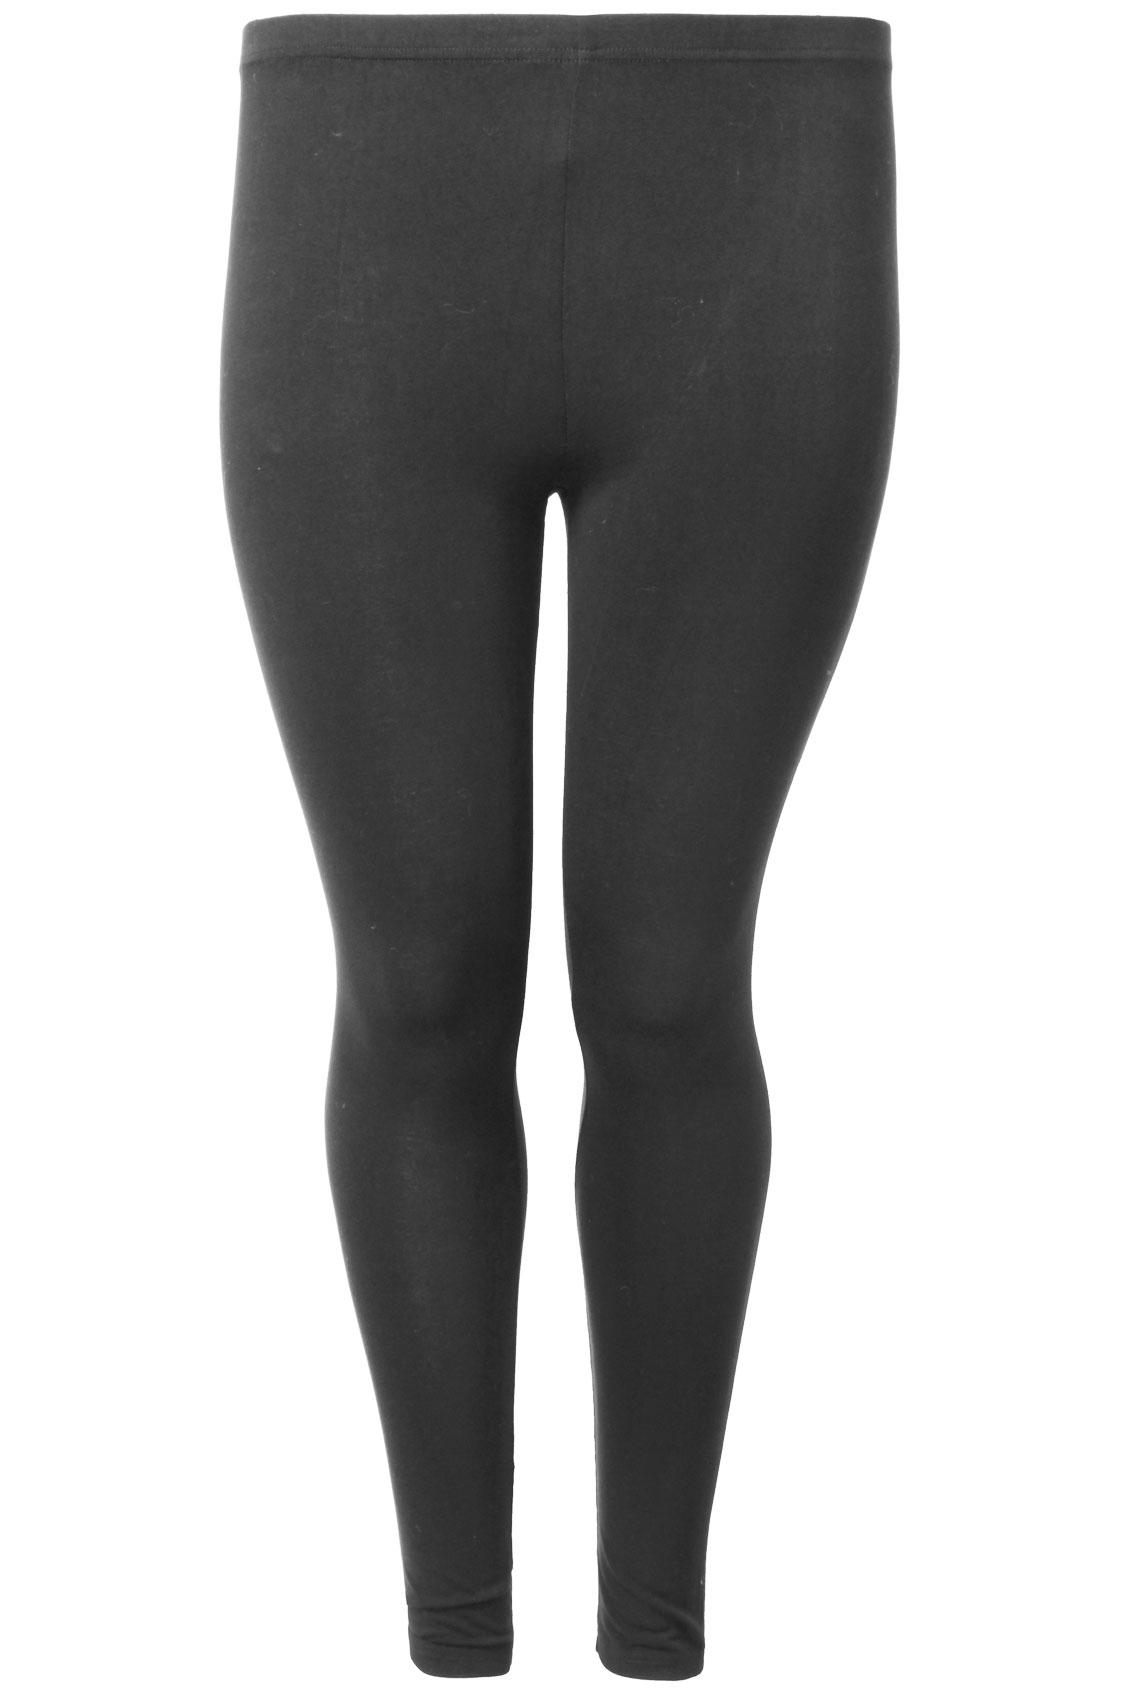 Brown Viscose Elastane Leggings Plus Sizes: 16,18,20,22,24